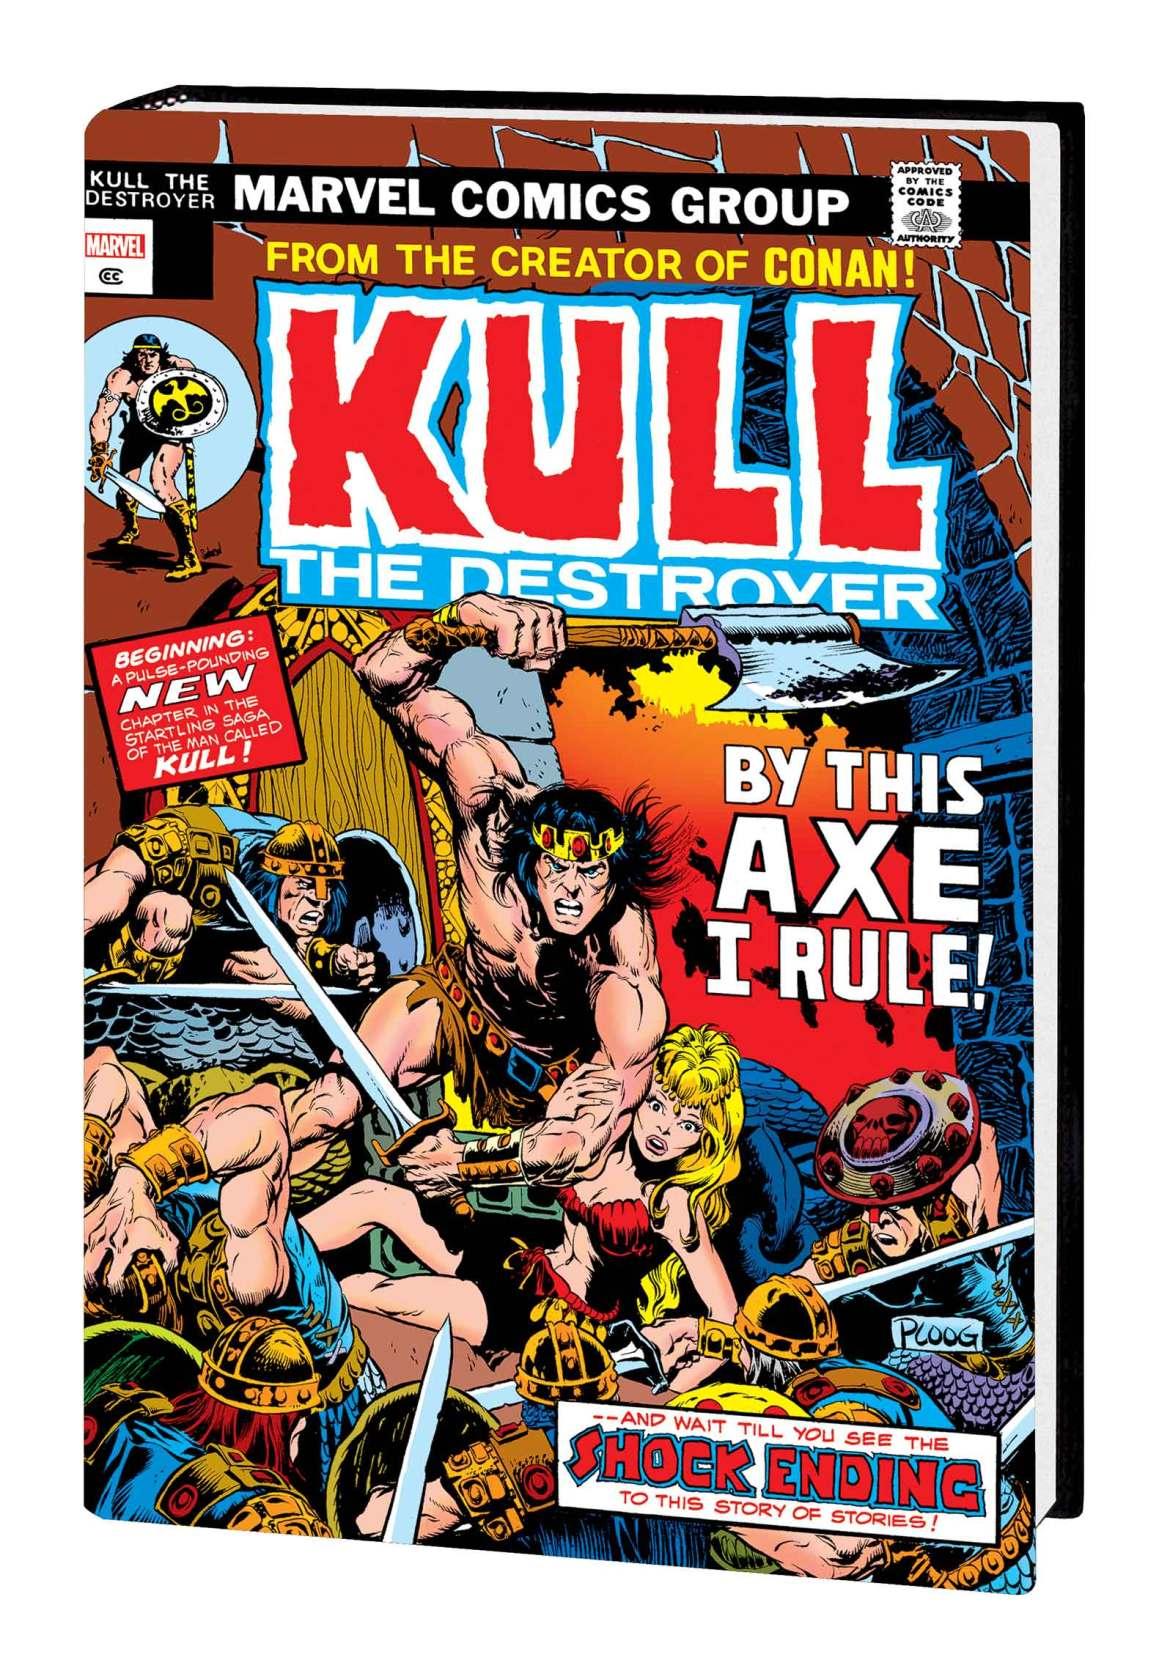 KULLDESTMAROMNI_HC_PLOOG Marvel Comics May 2021 Solicitations